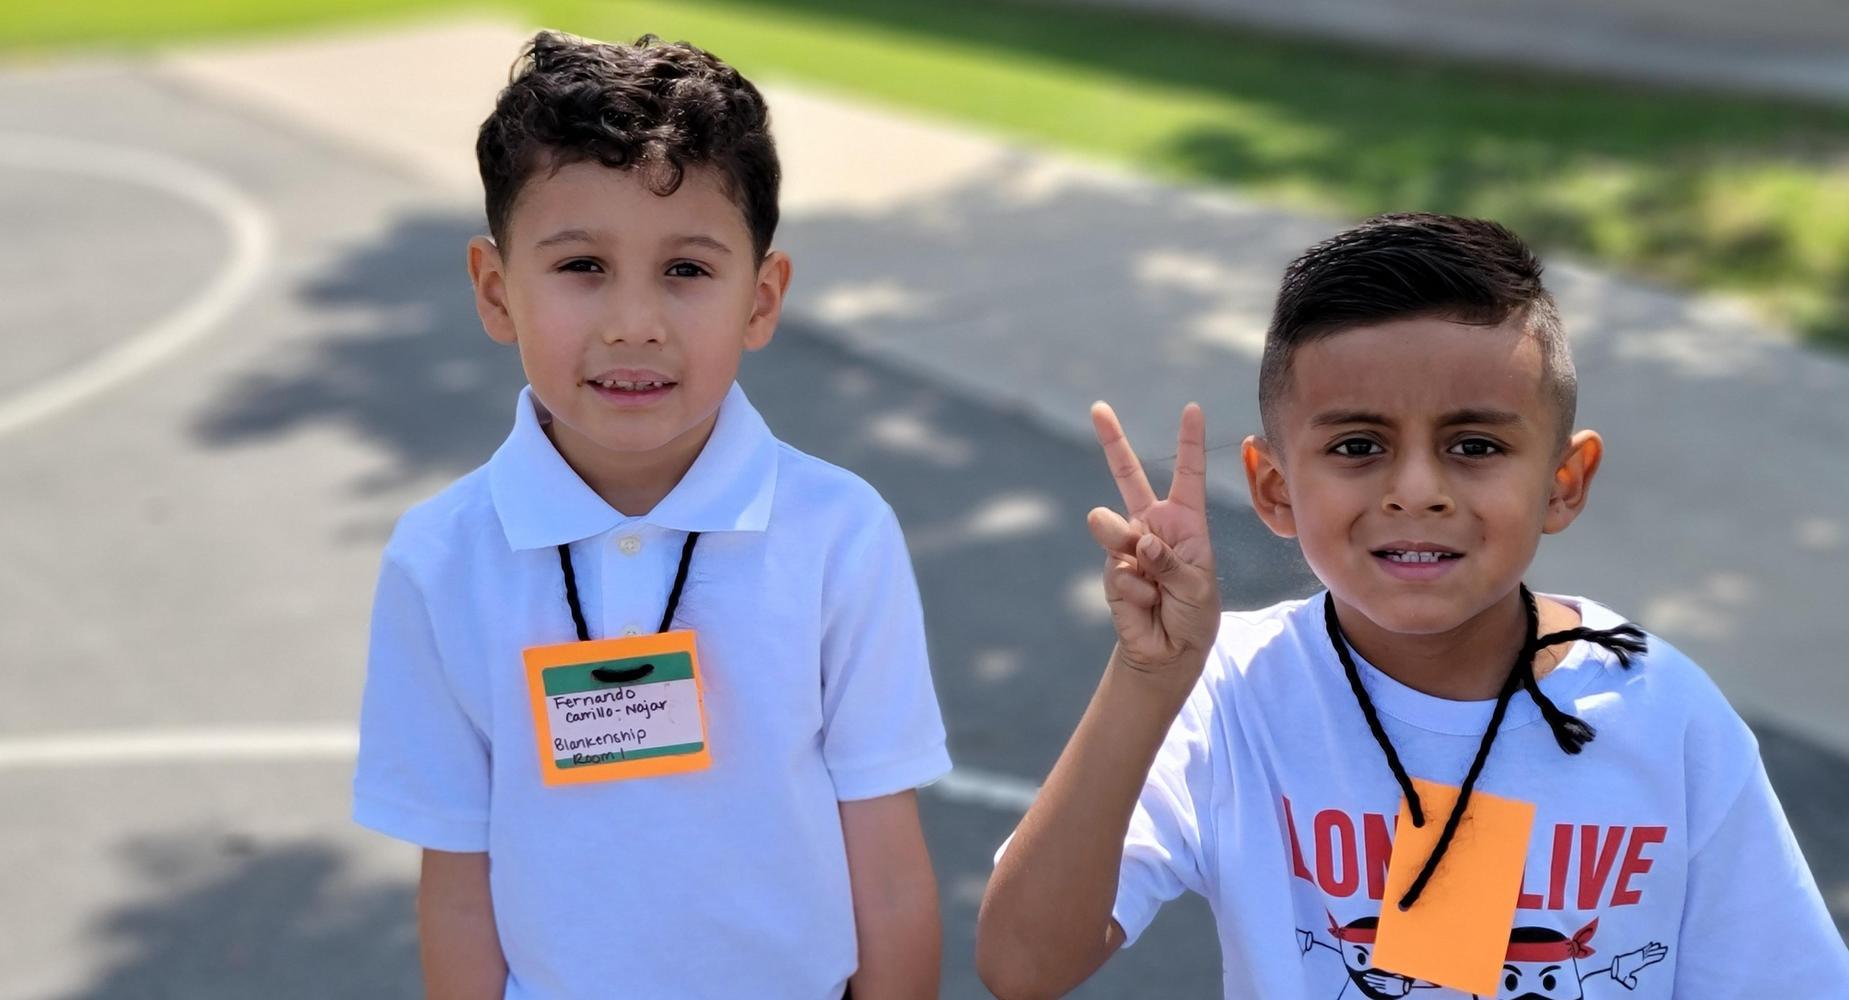 Two Boys Enjoying Recess